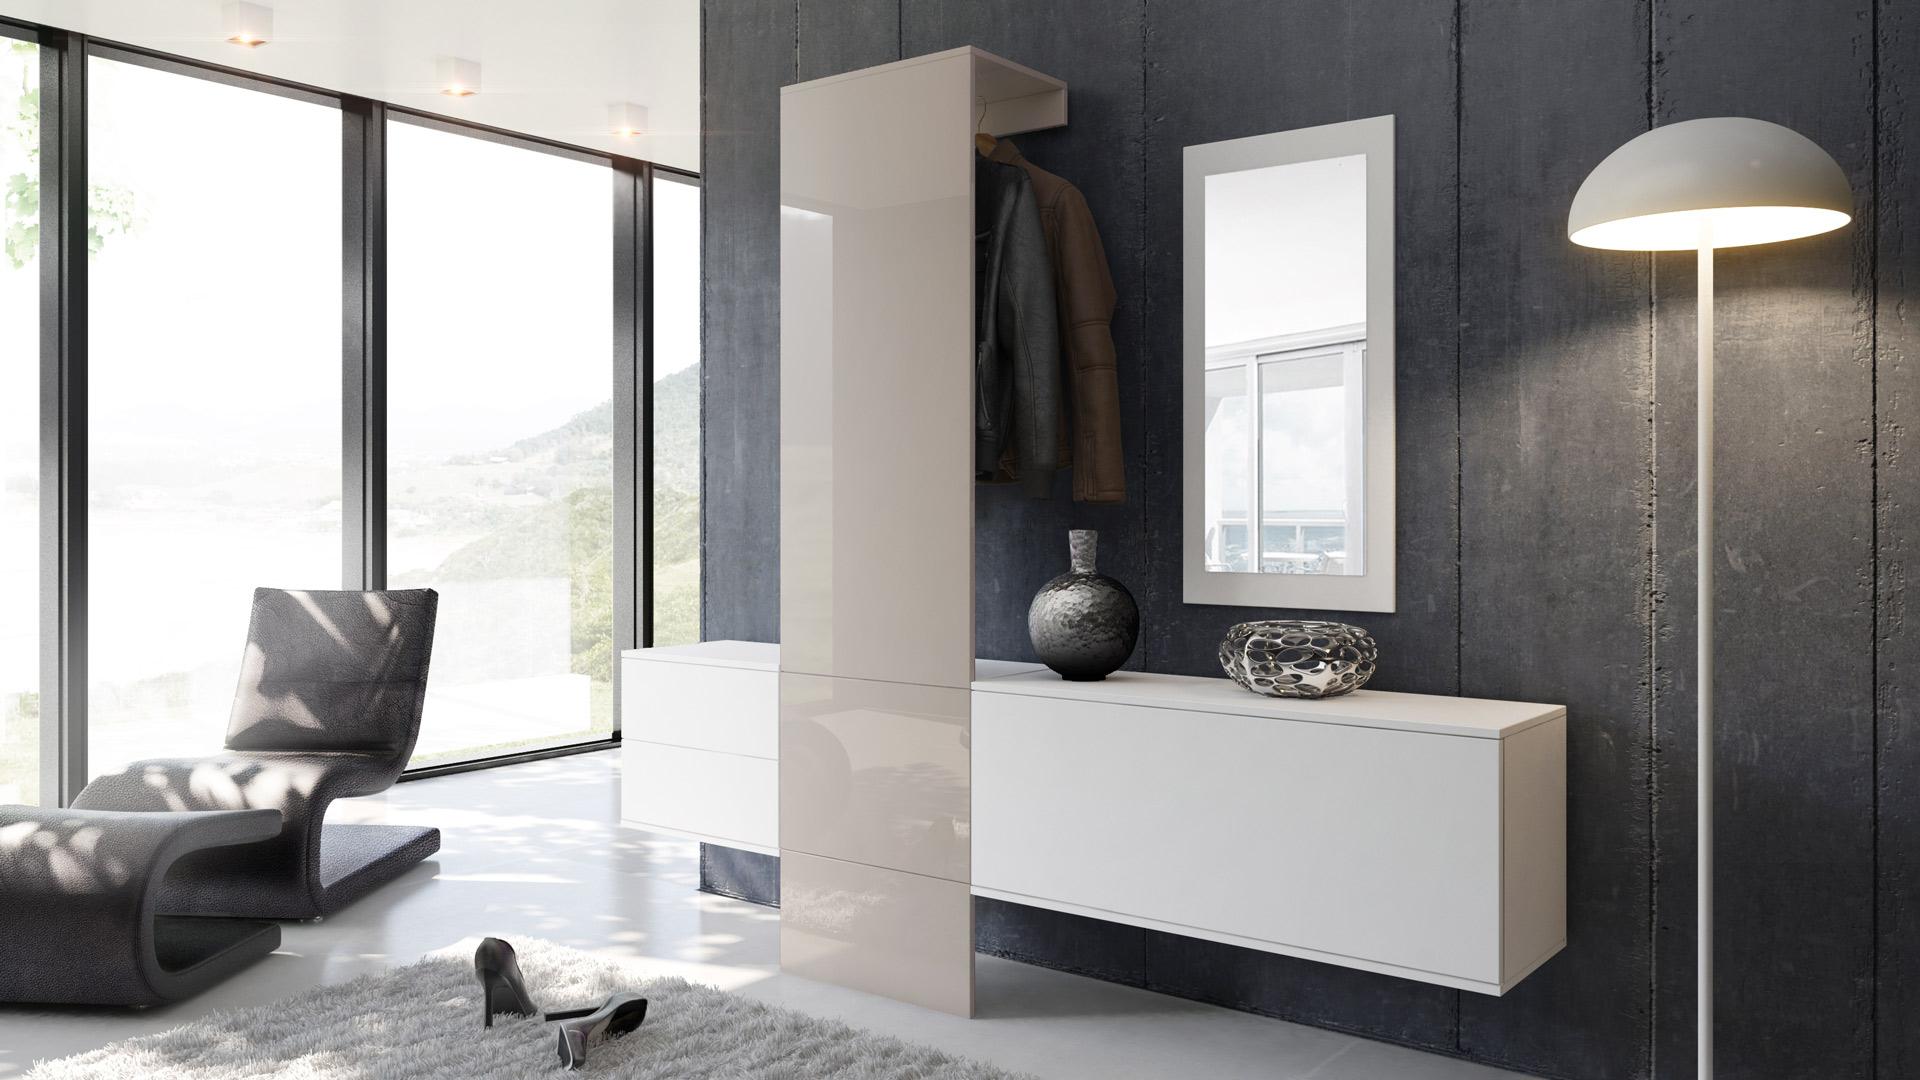 garderobenset flur garderobe diele carlton set 1 in wei. Black Bedroom Furniture Sets. Home Design Ideas